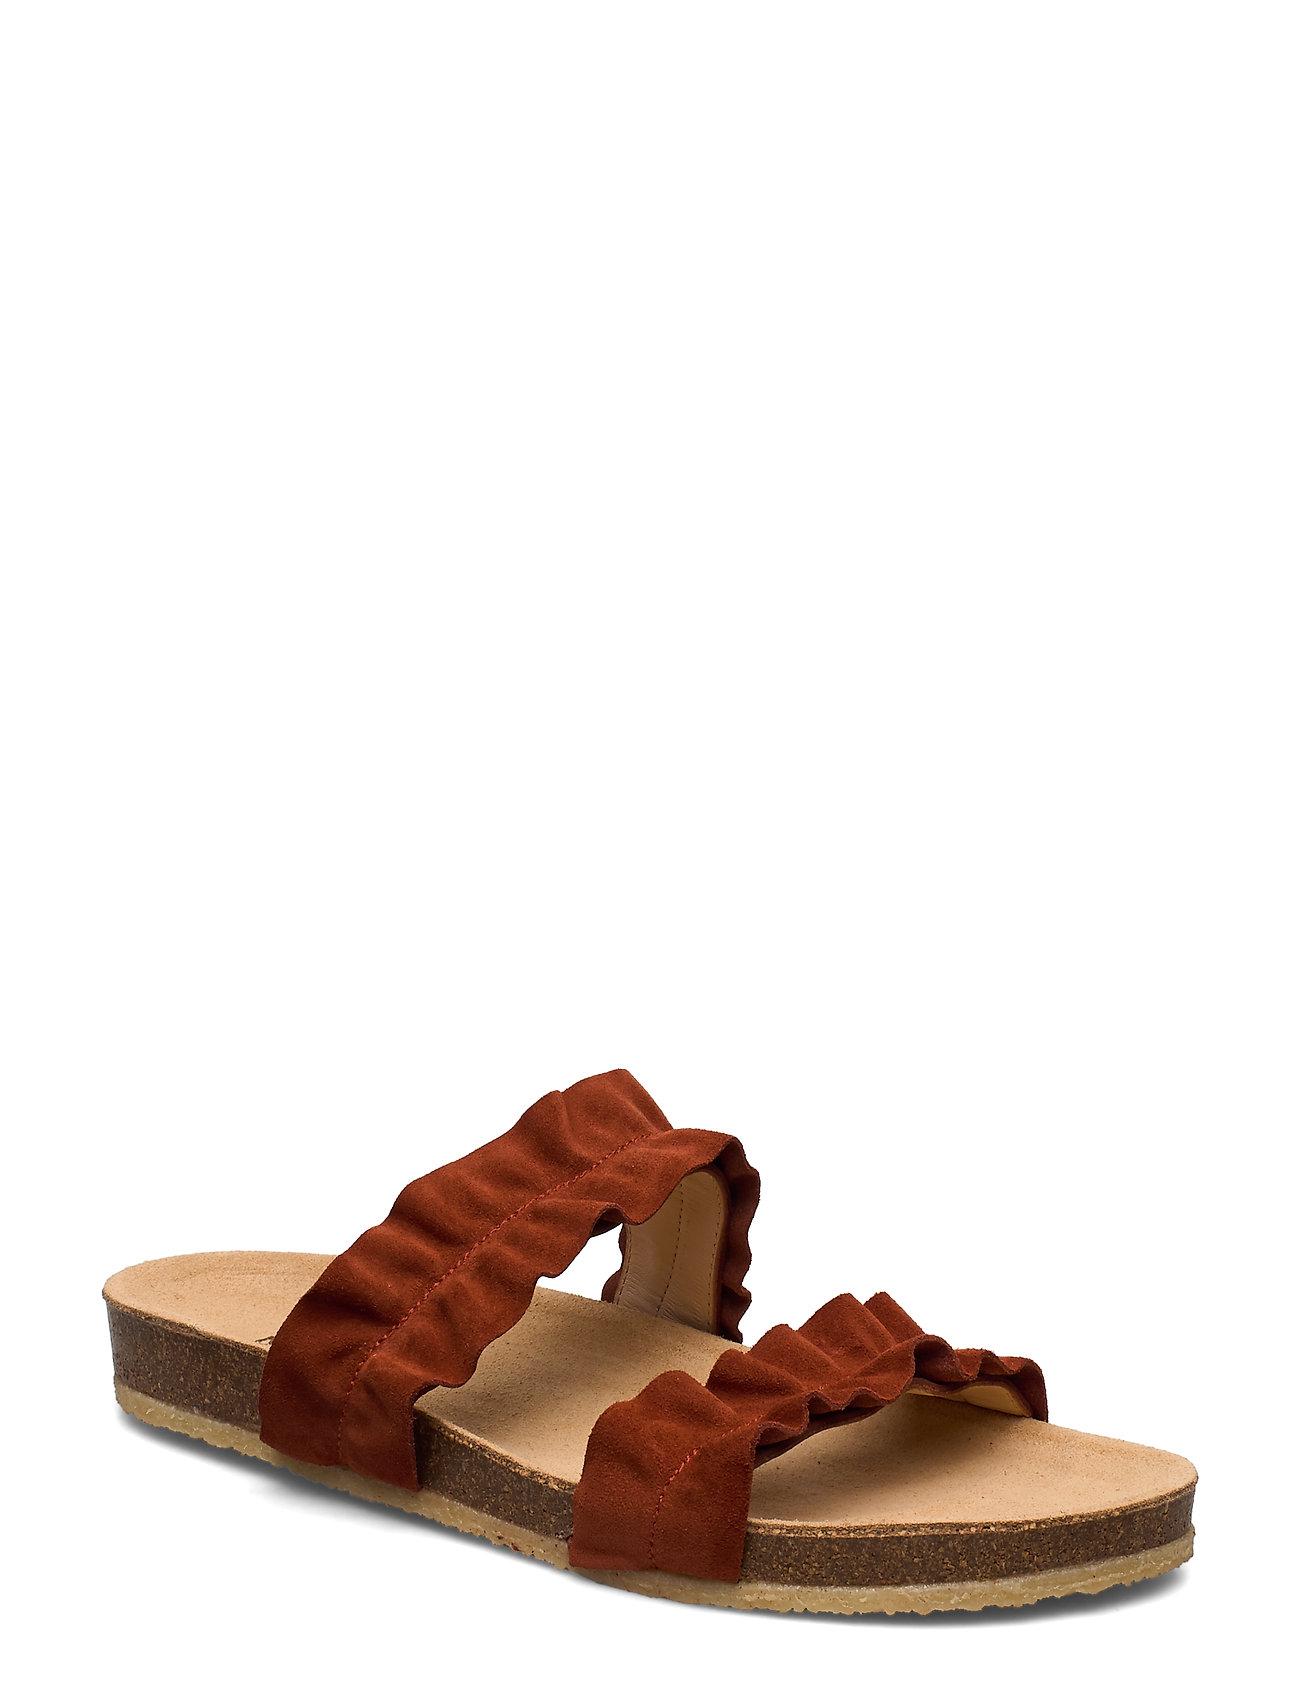 Image of Sandals - Flat - Open Toe - Op Shoes Summer Shoes Flat Sandals Brun ANGULUS (3336494531)